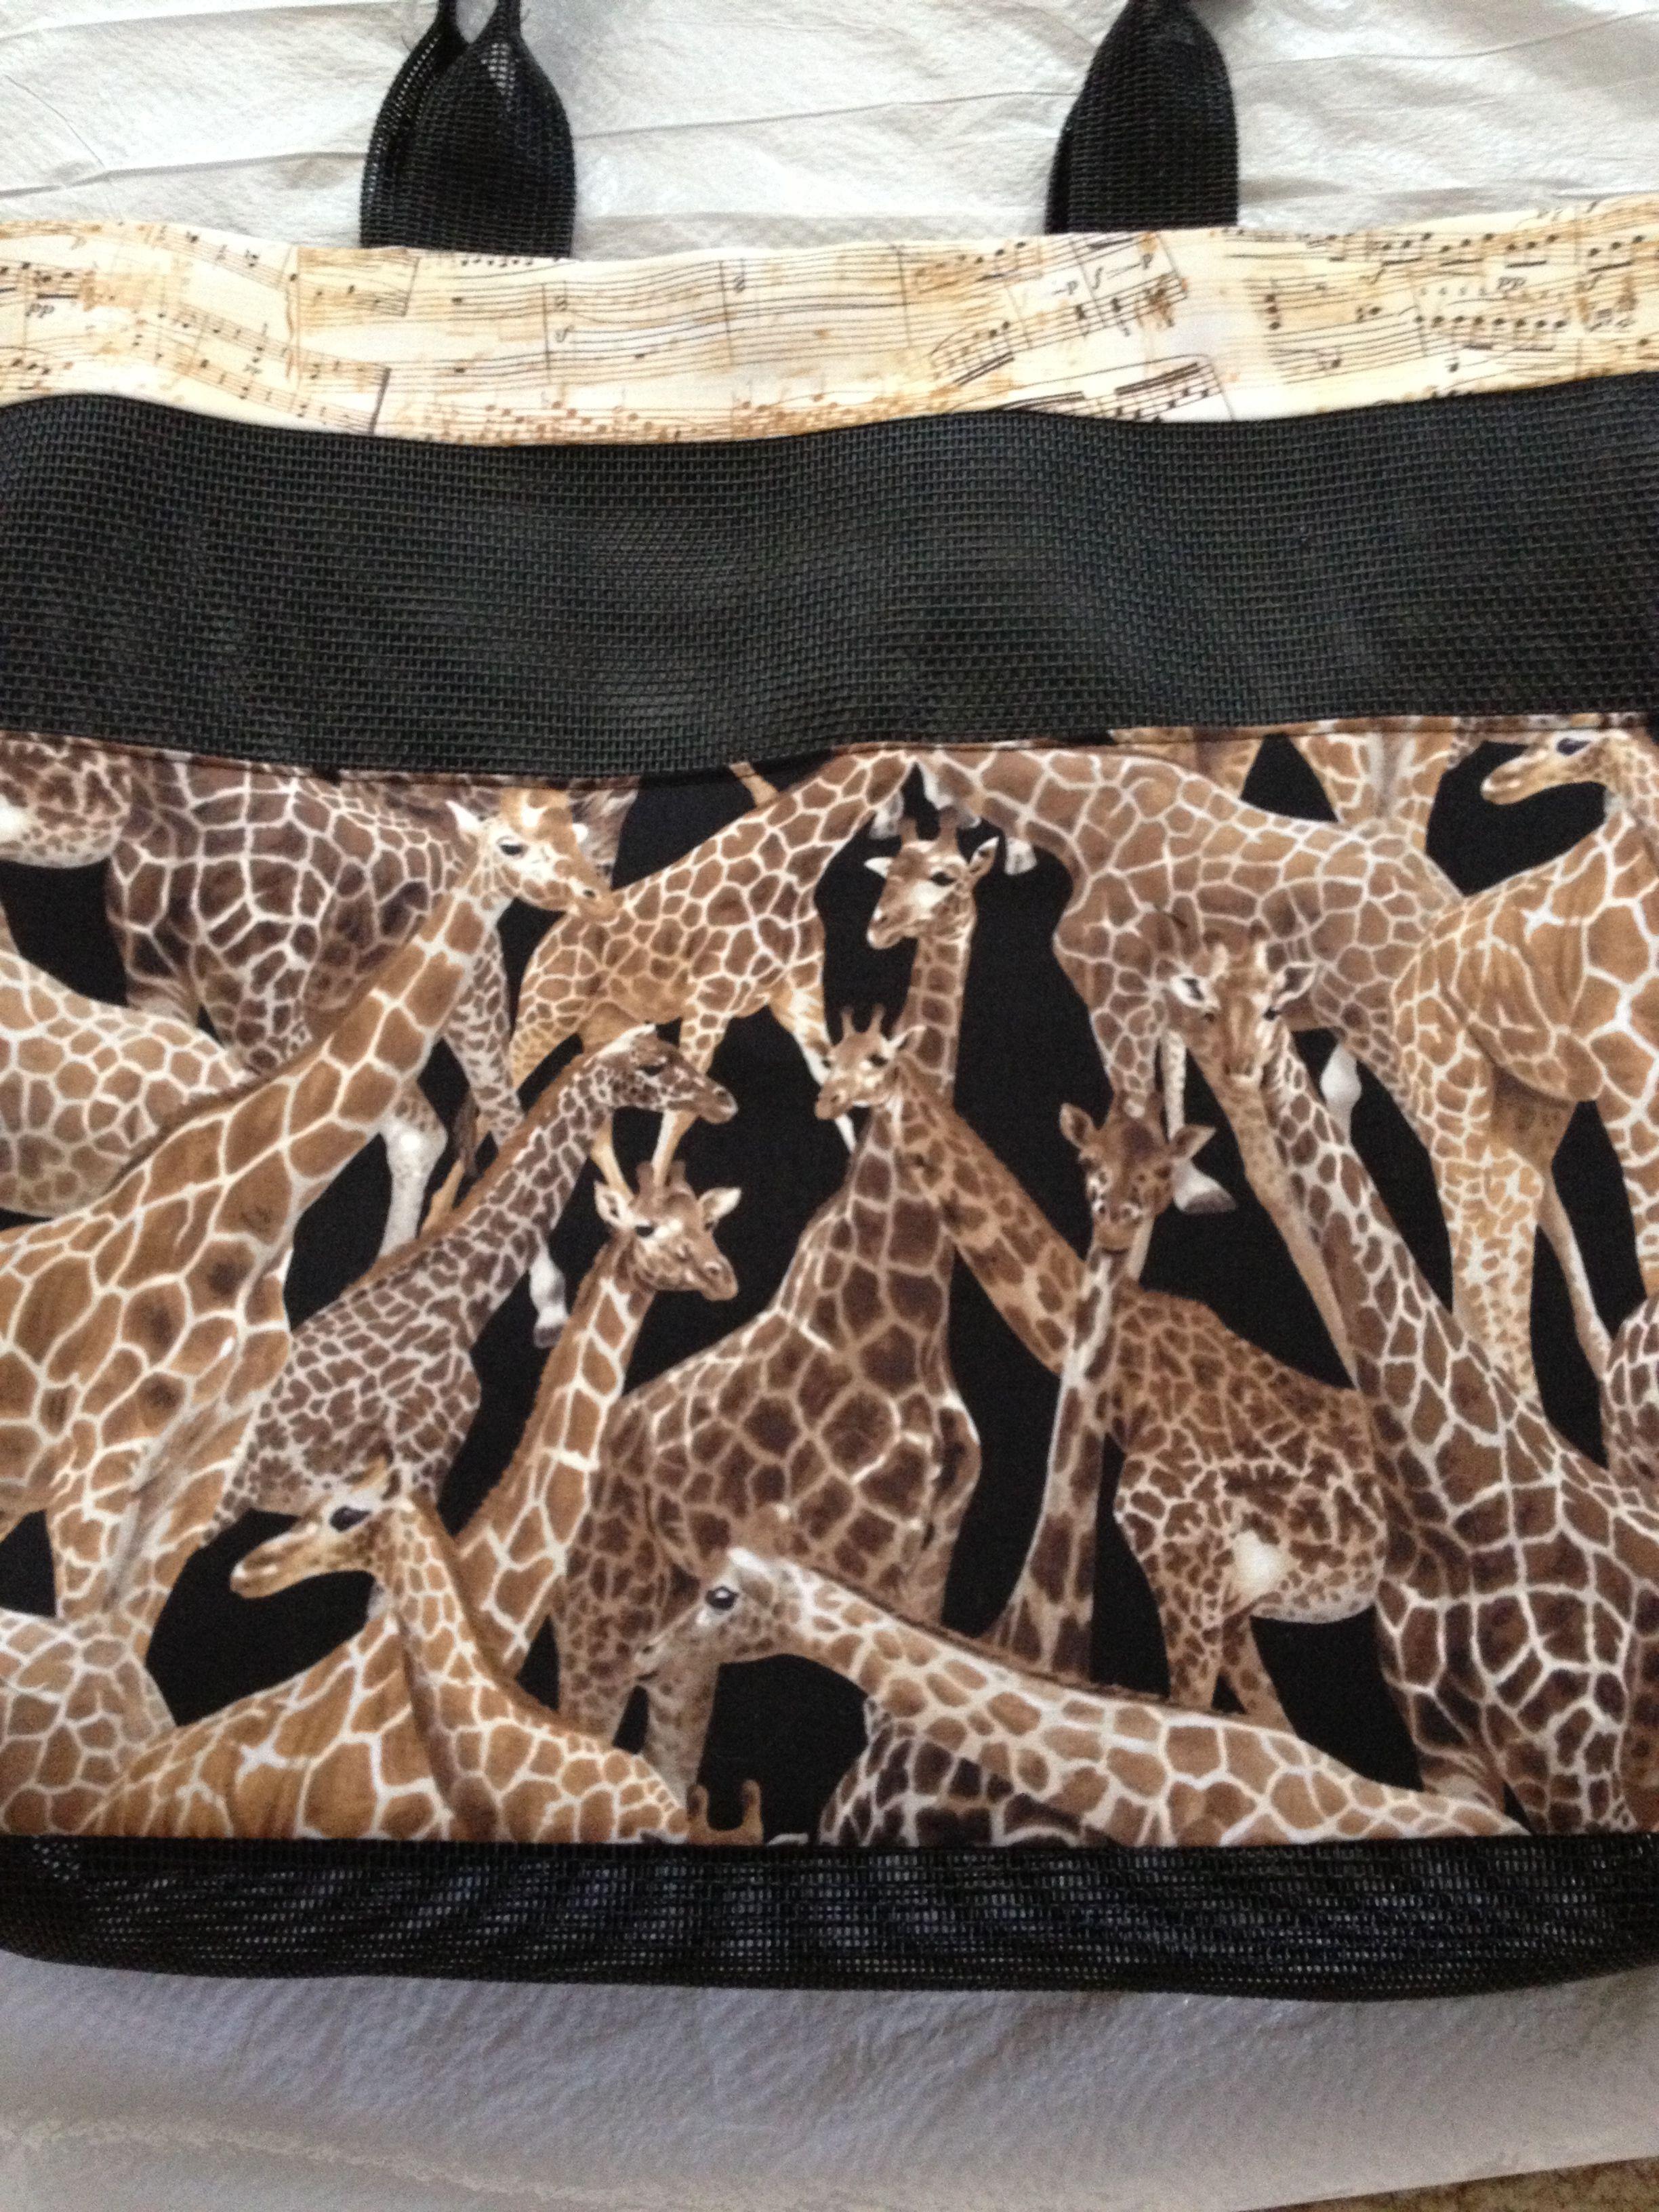 OC High School of the Arts OShop handmade totebag. Giraffes